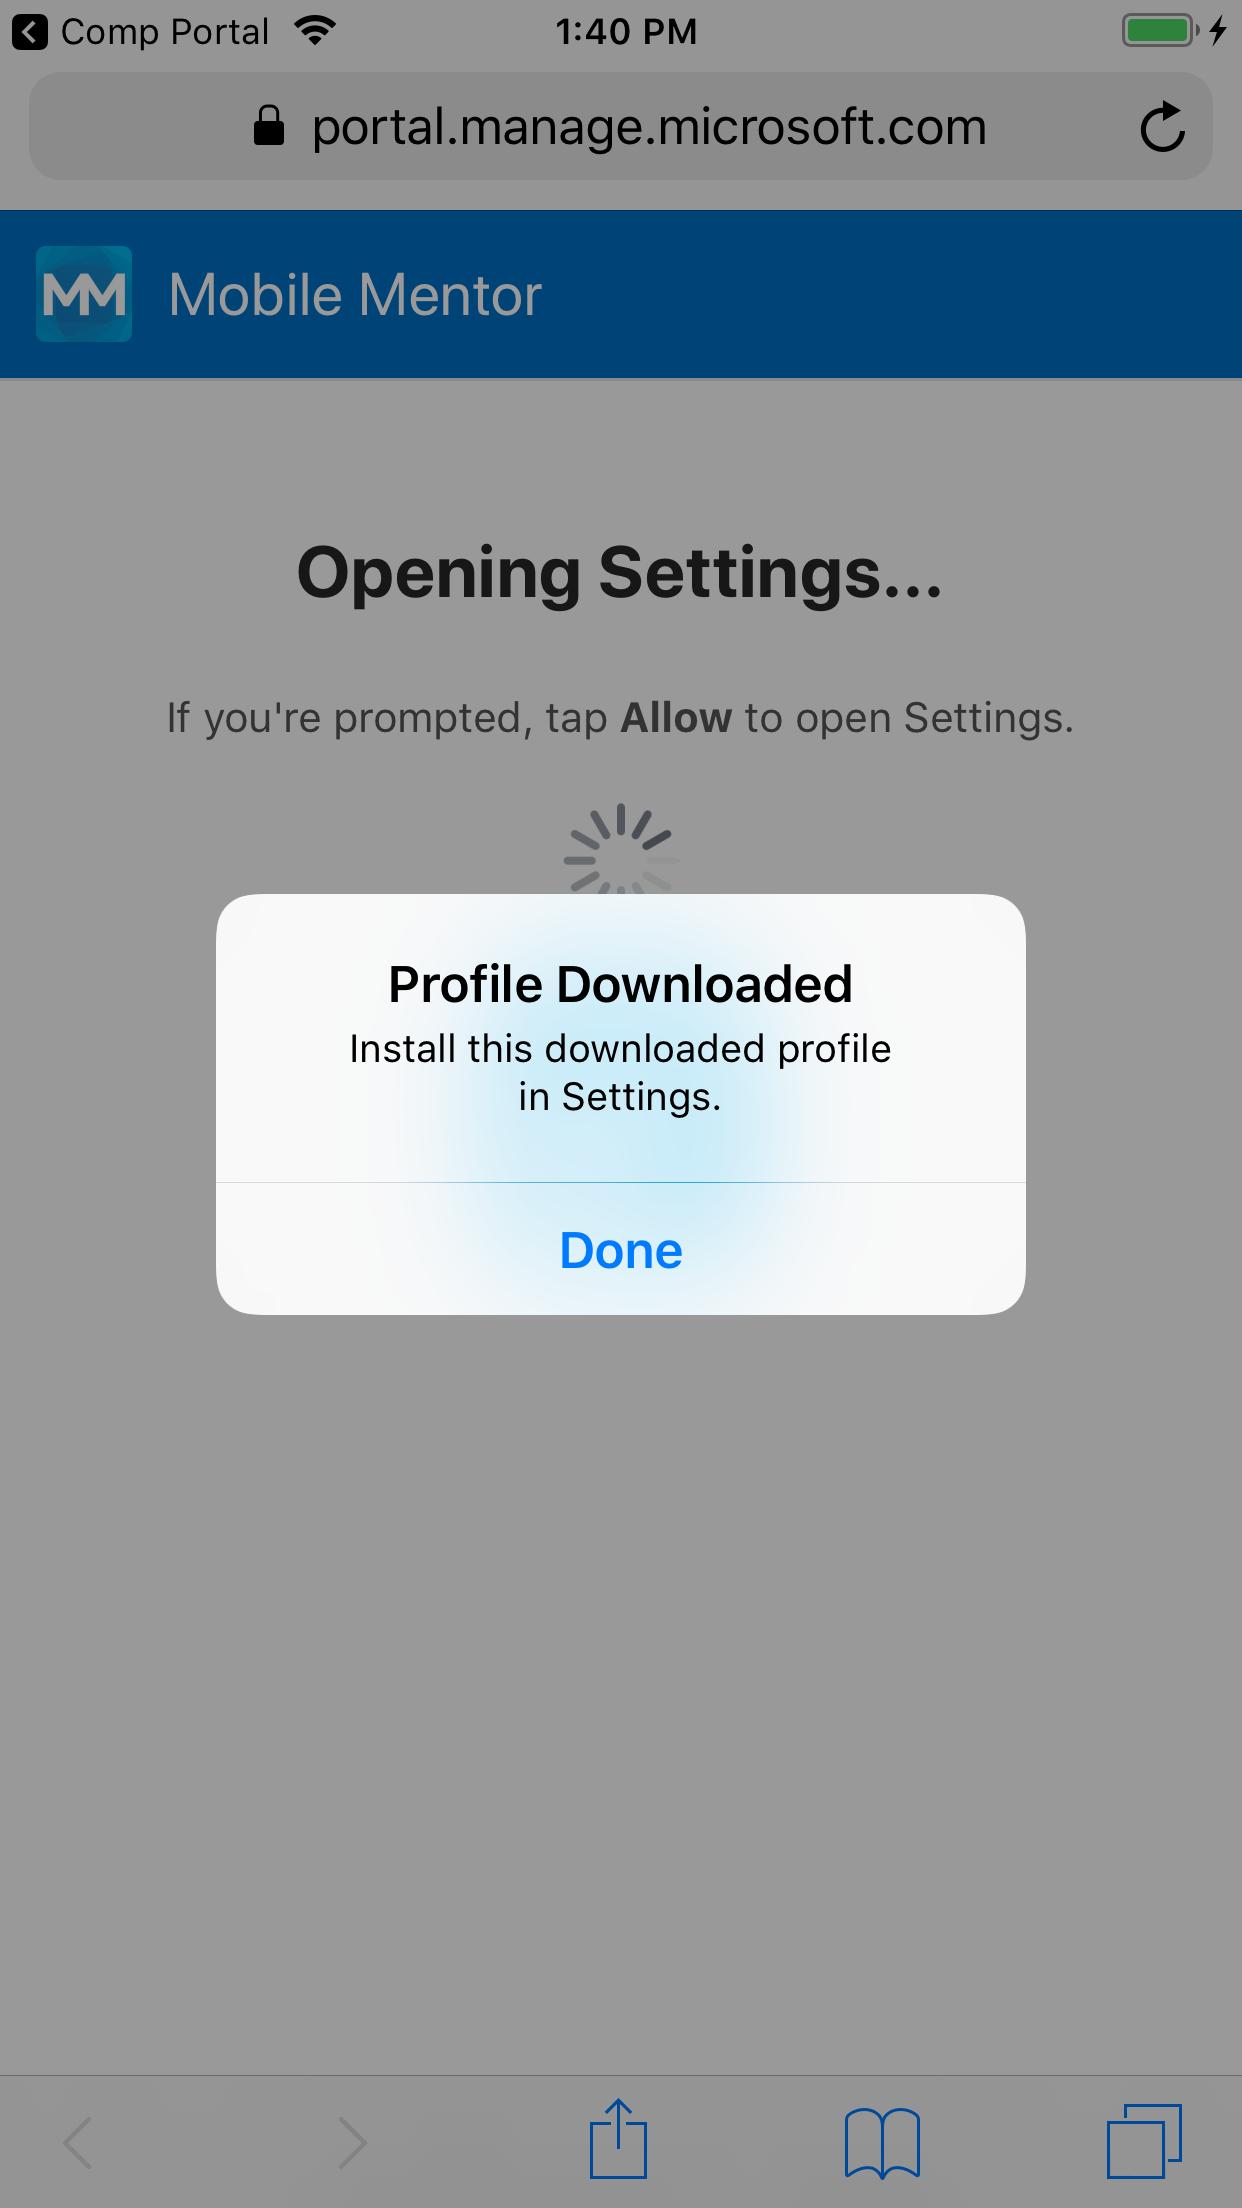 iOS 12 1 3 (beta 4) changes to MDM enrolment workflow - Apple iOS